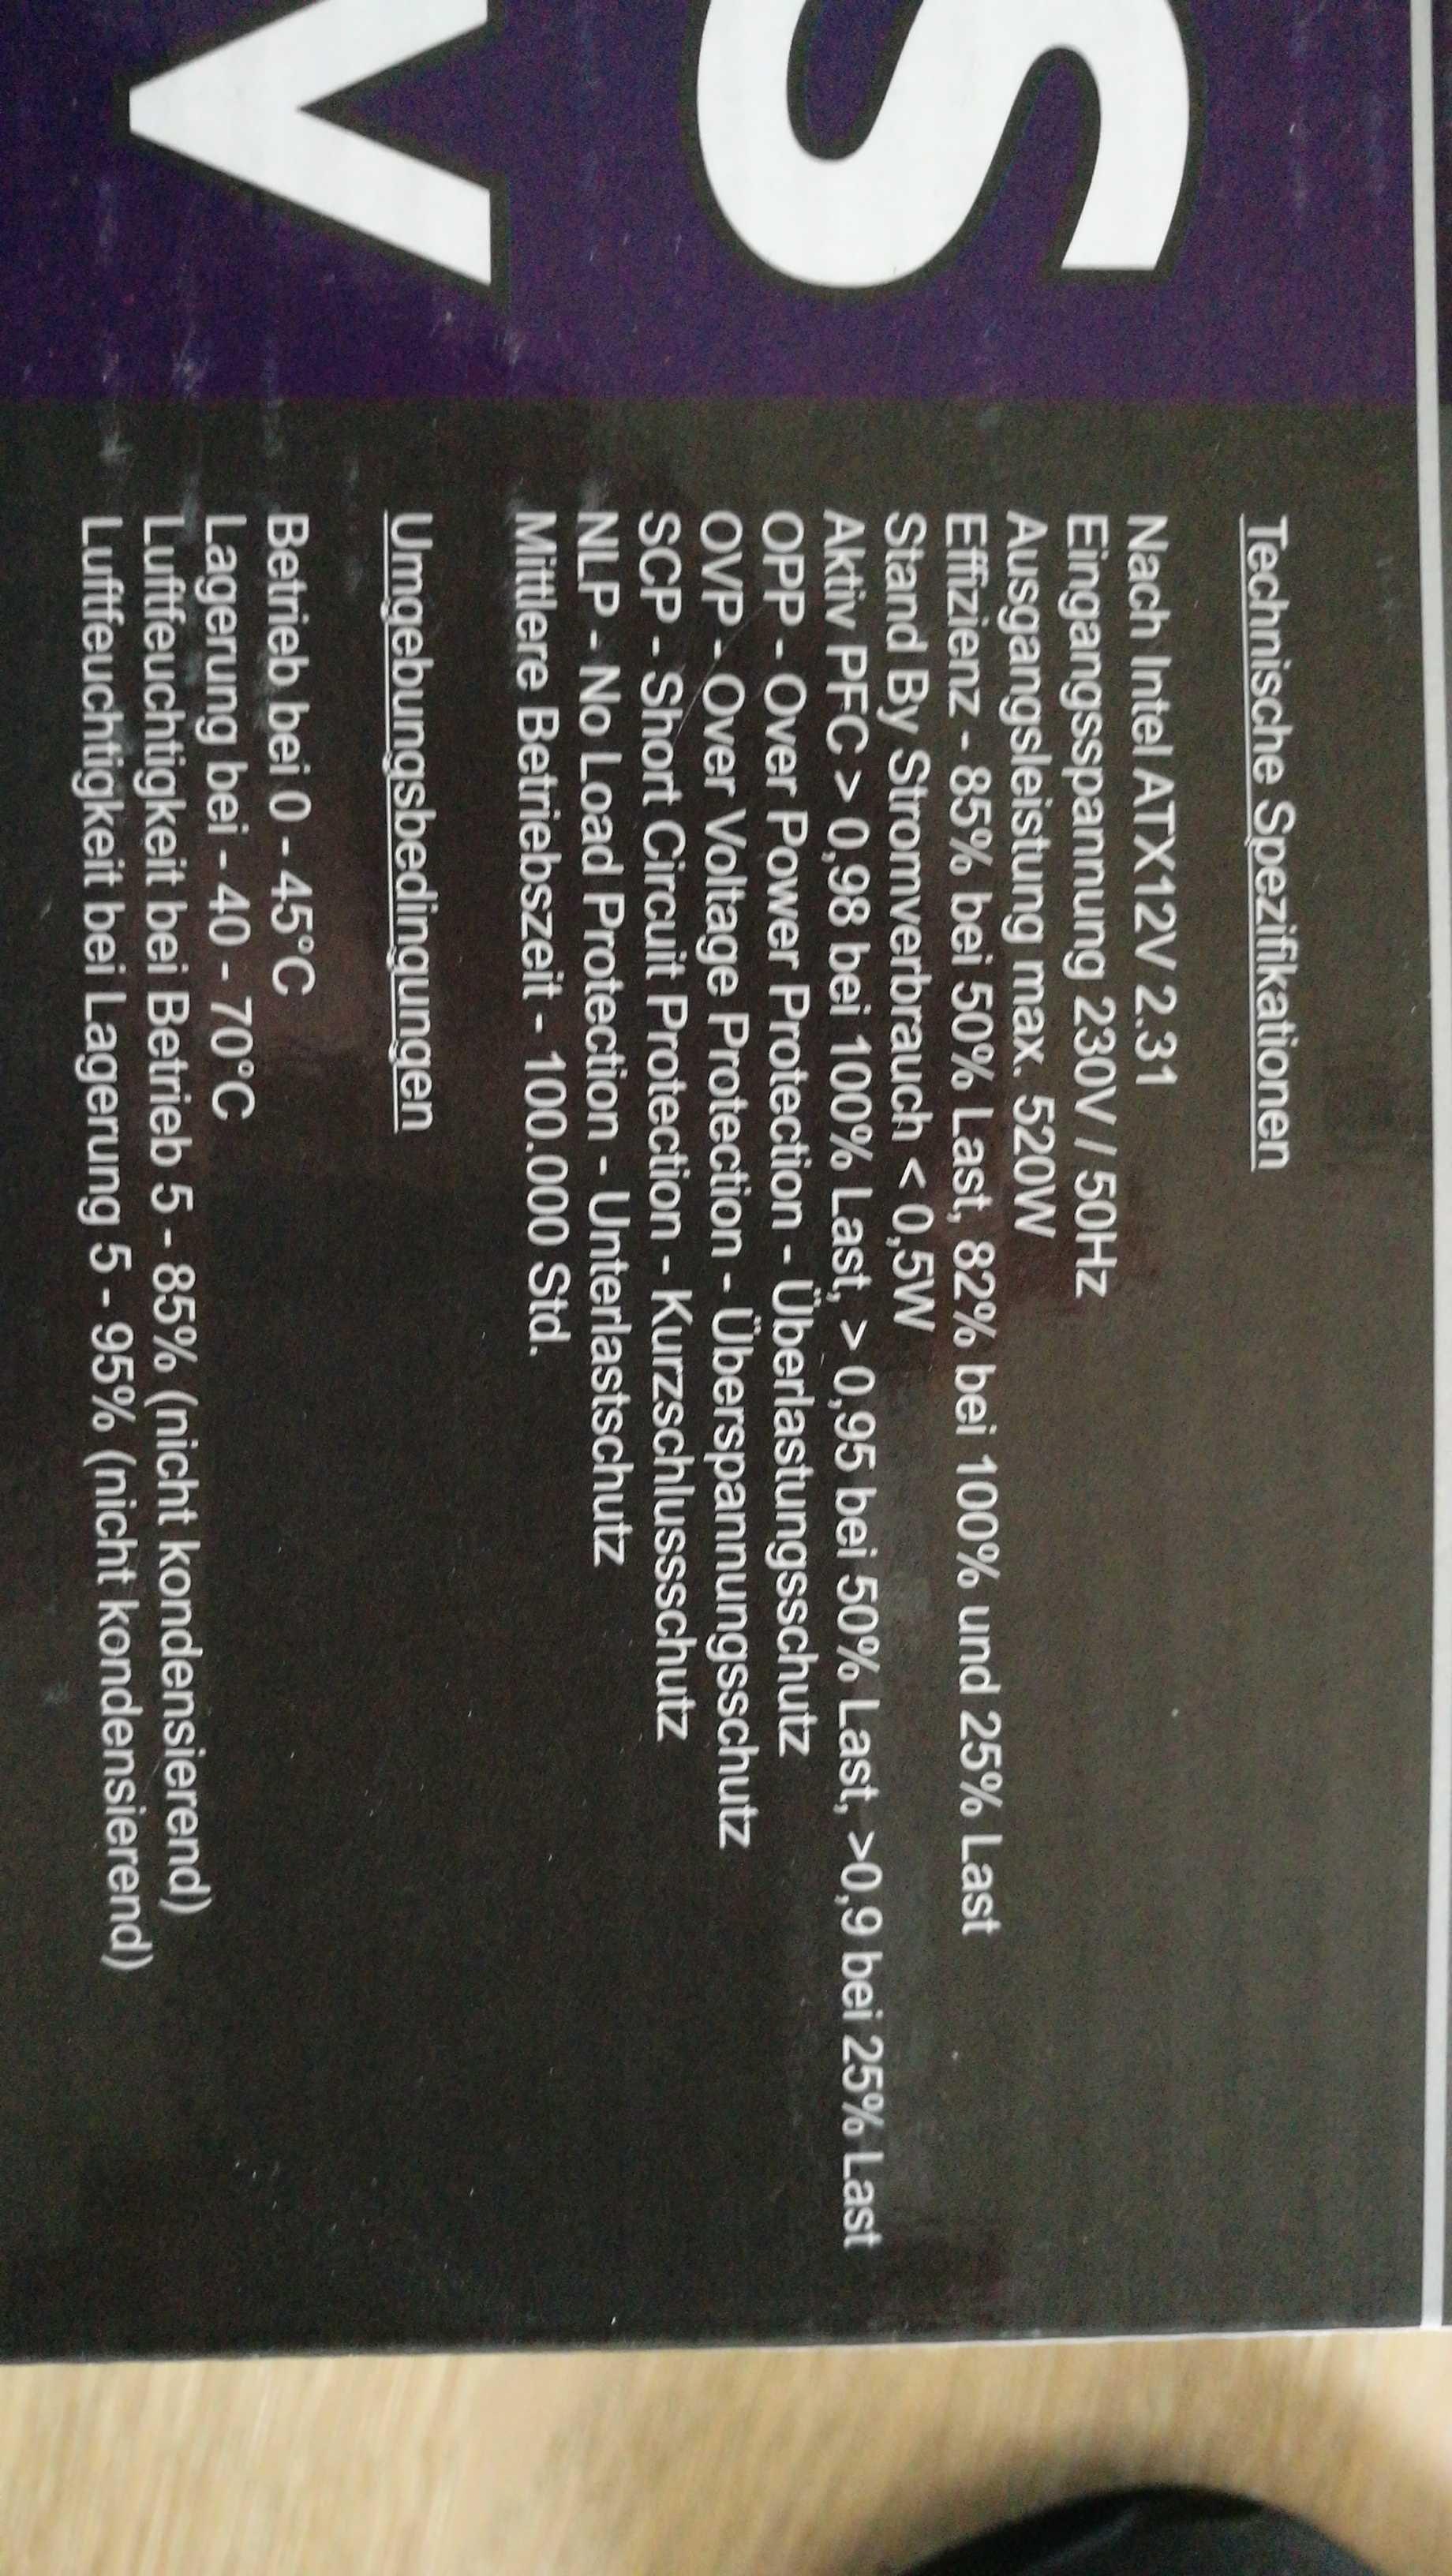 25b70cfc01bfd05f05fa96e5c35758e6 - Asus prime b350 plus bootet nicht